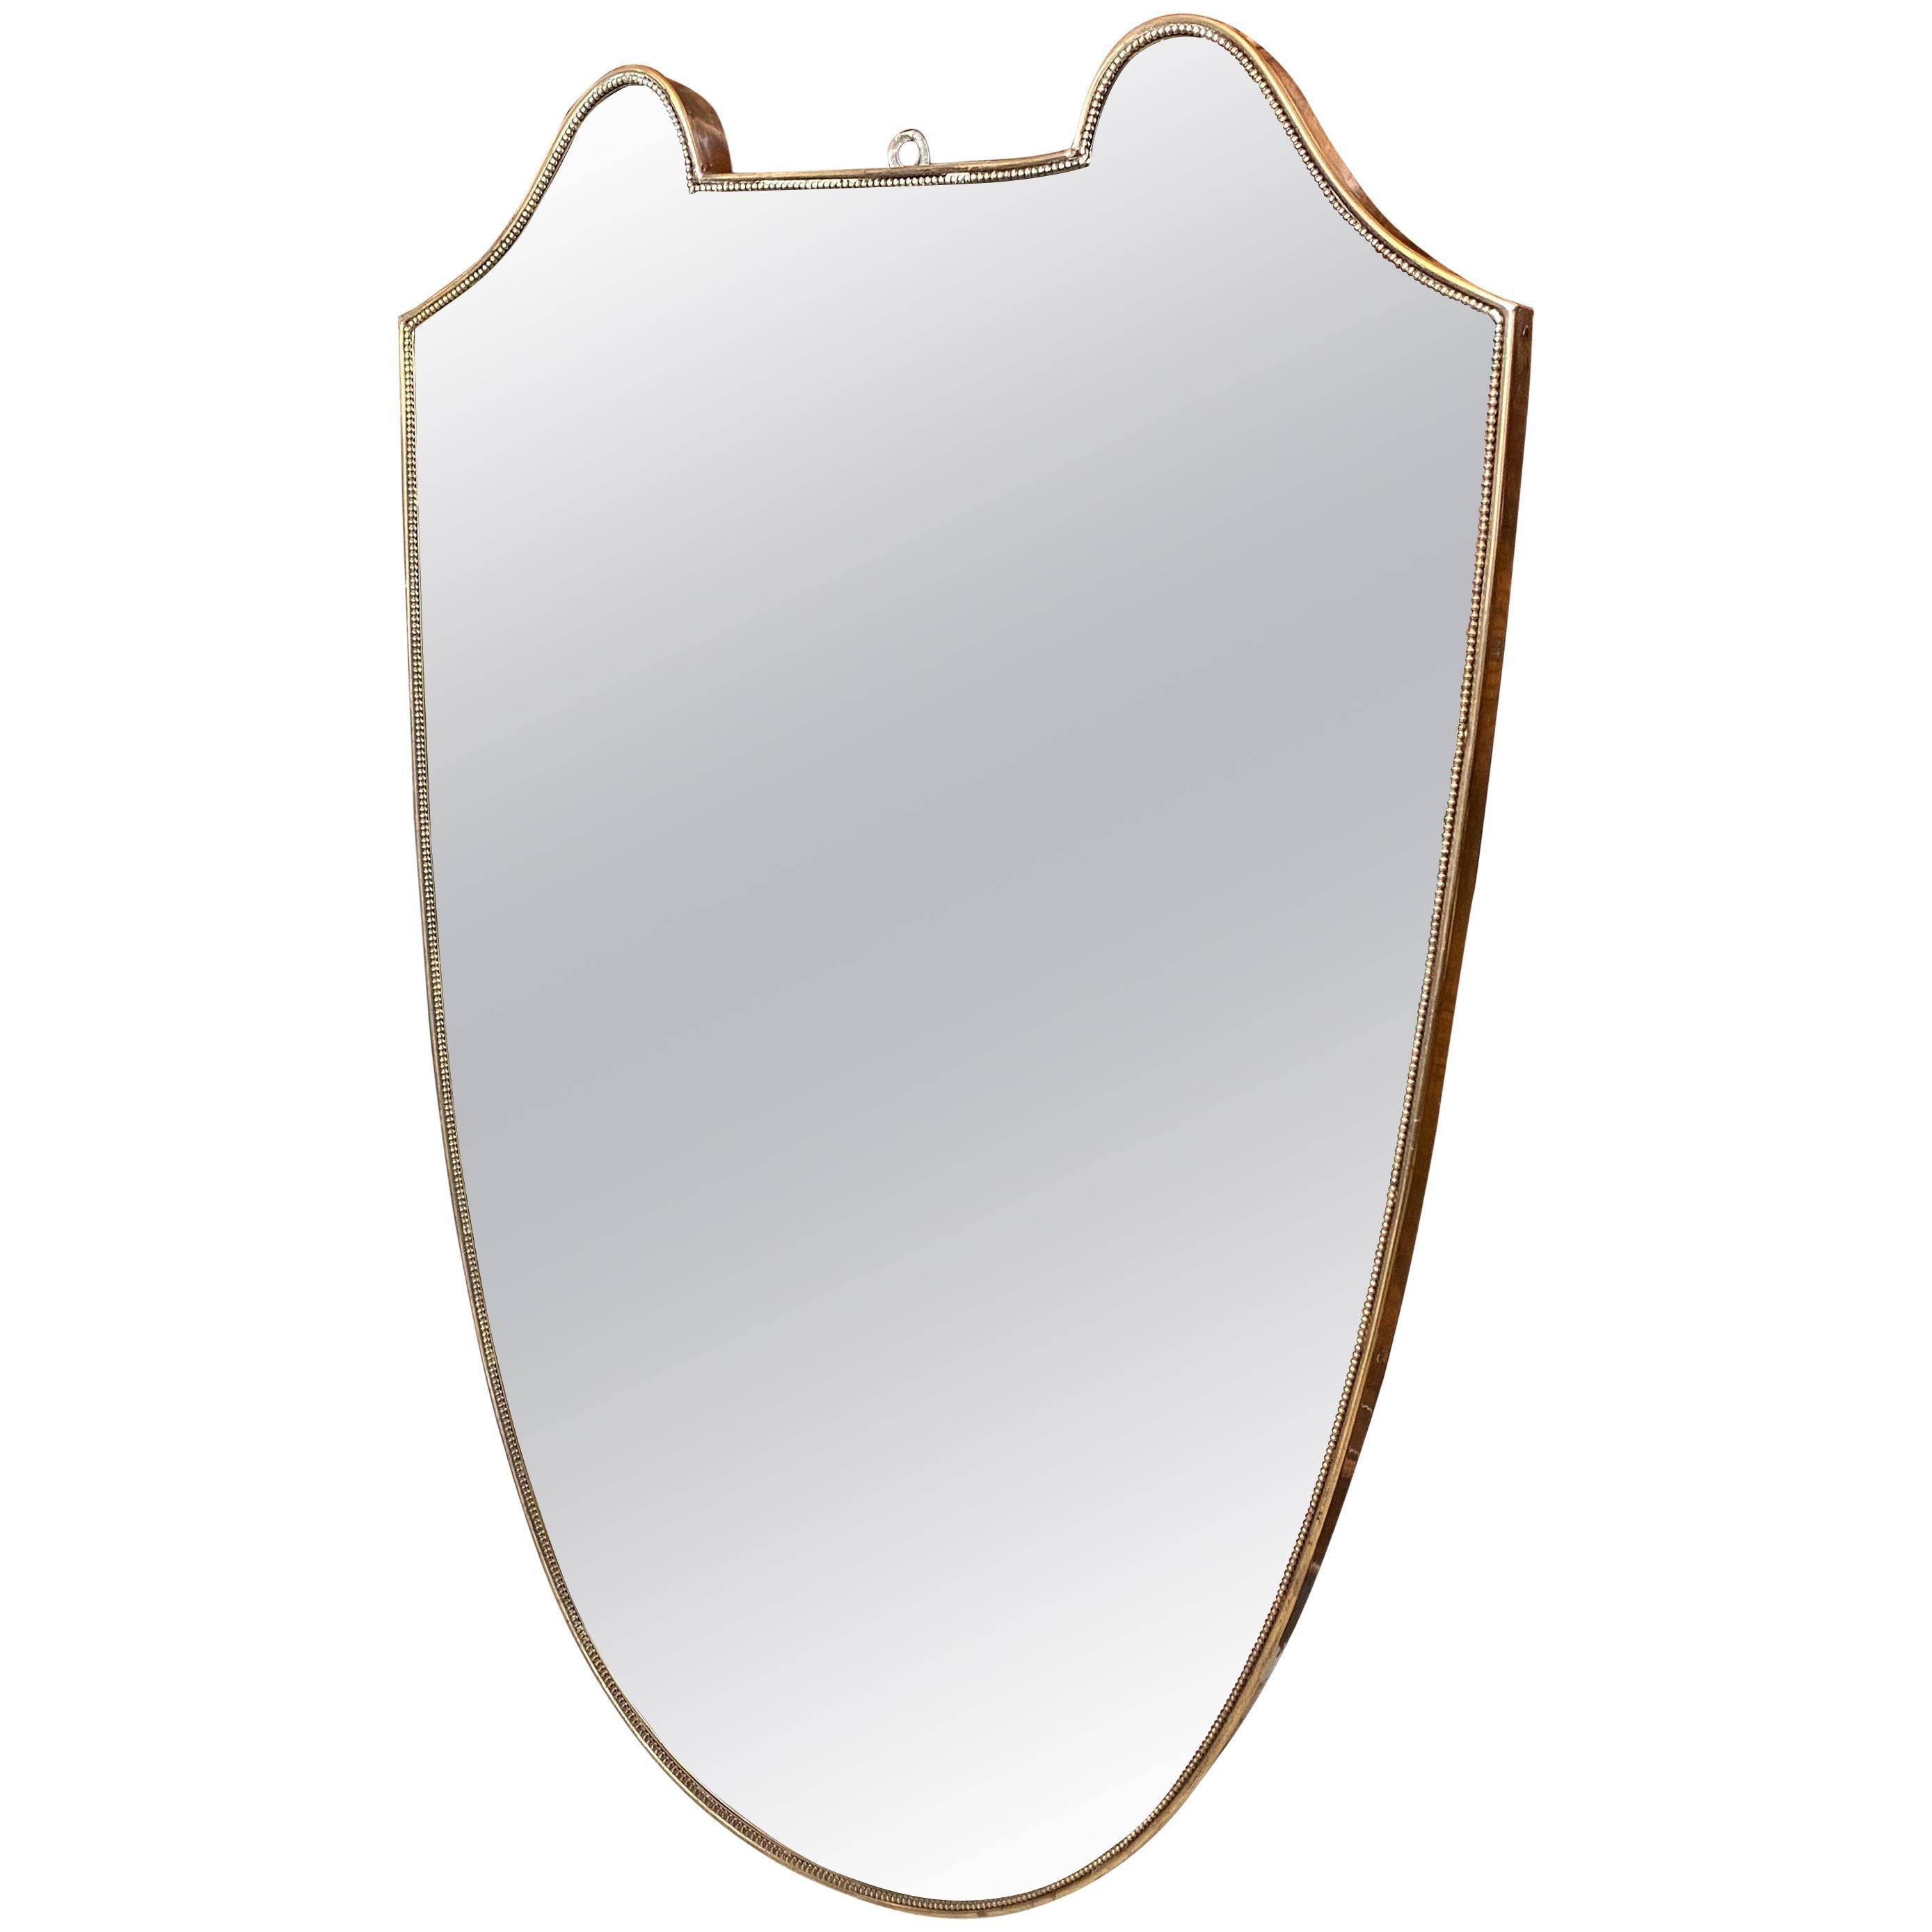 1950s Mid-Century Modern Brass Italian Wall Mirror in the Manner of Gio Ponti